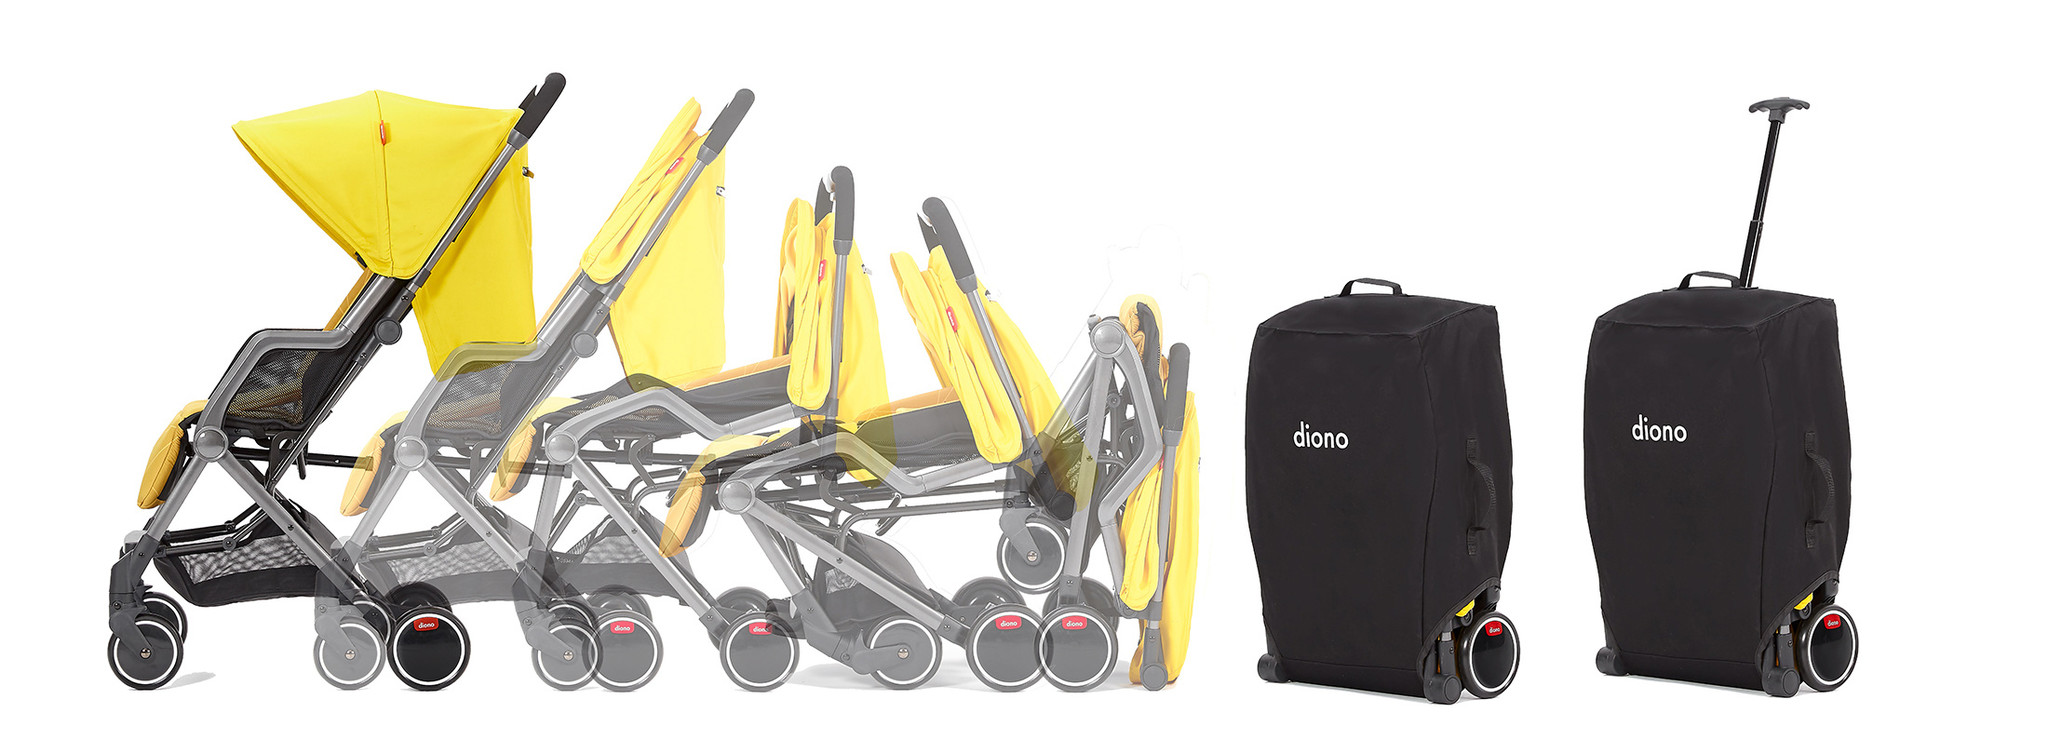 Diono Diono Traverze Luxe Stroller - Black/Gold Cube